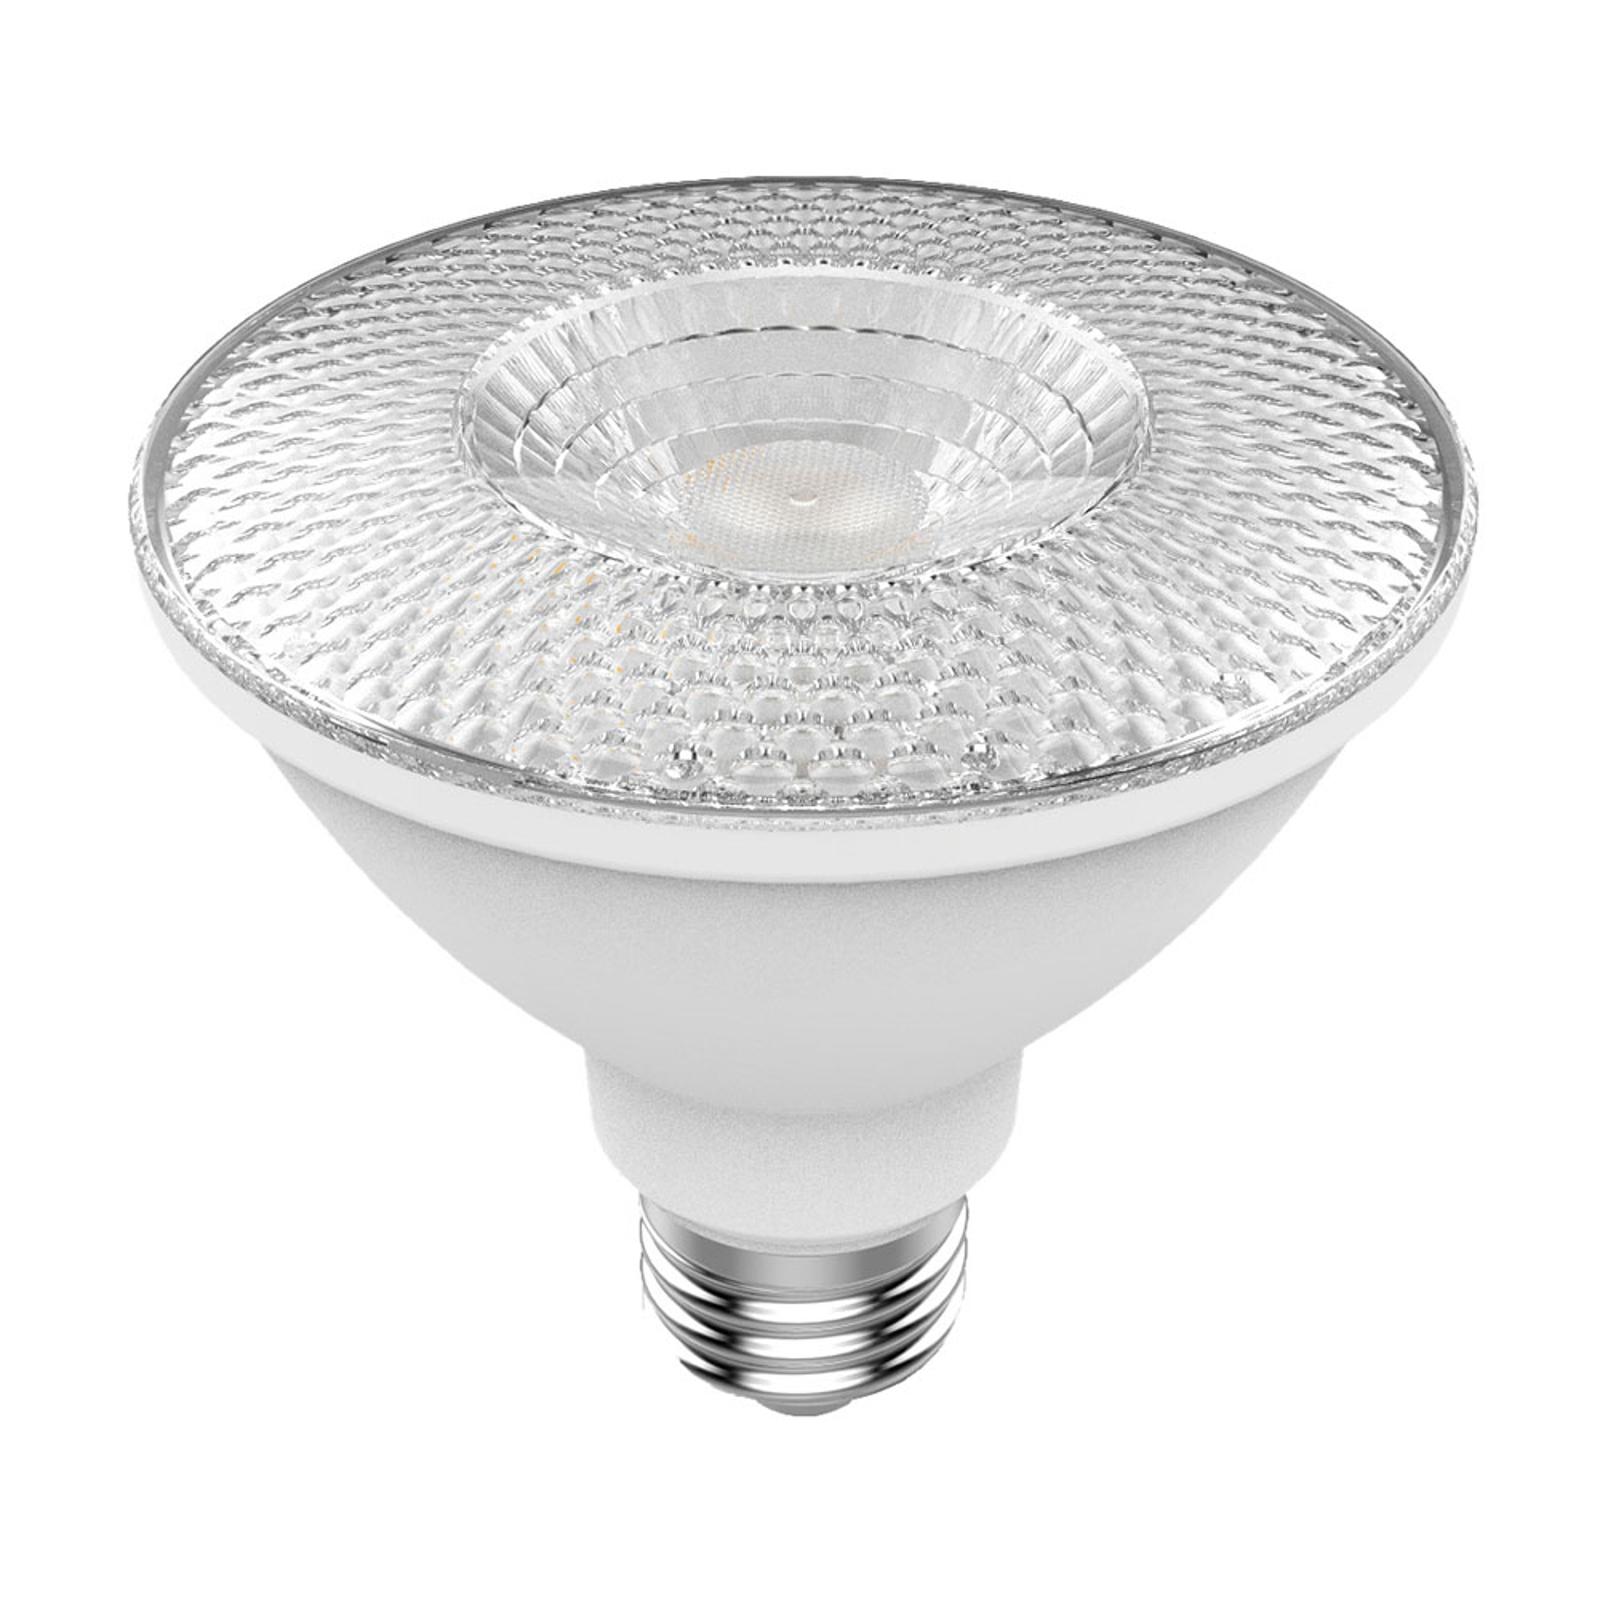 SEGULA LED-Reflektor PAR30 E27 11W 930 dimmbar